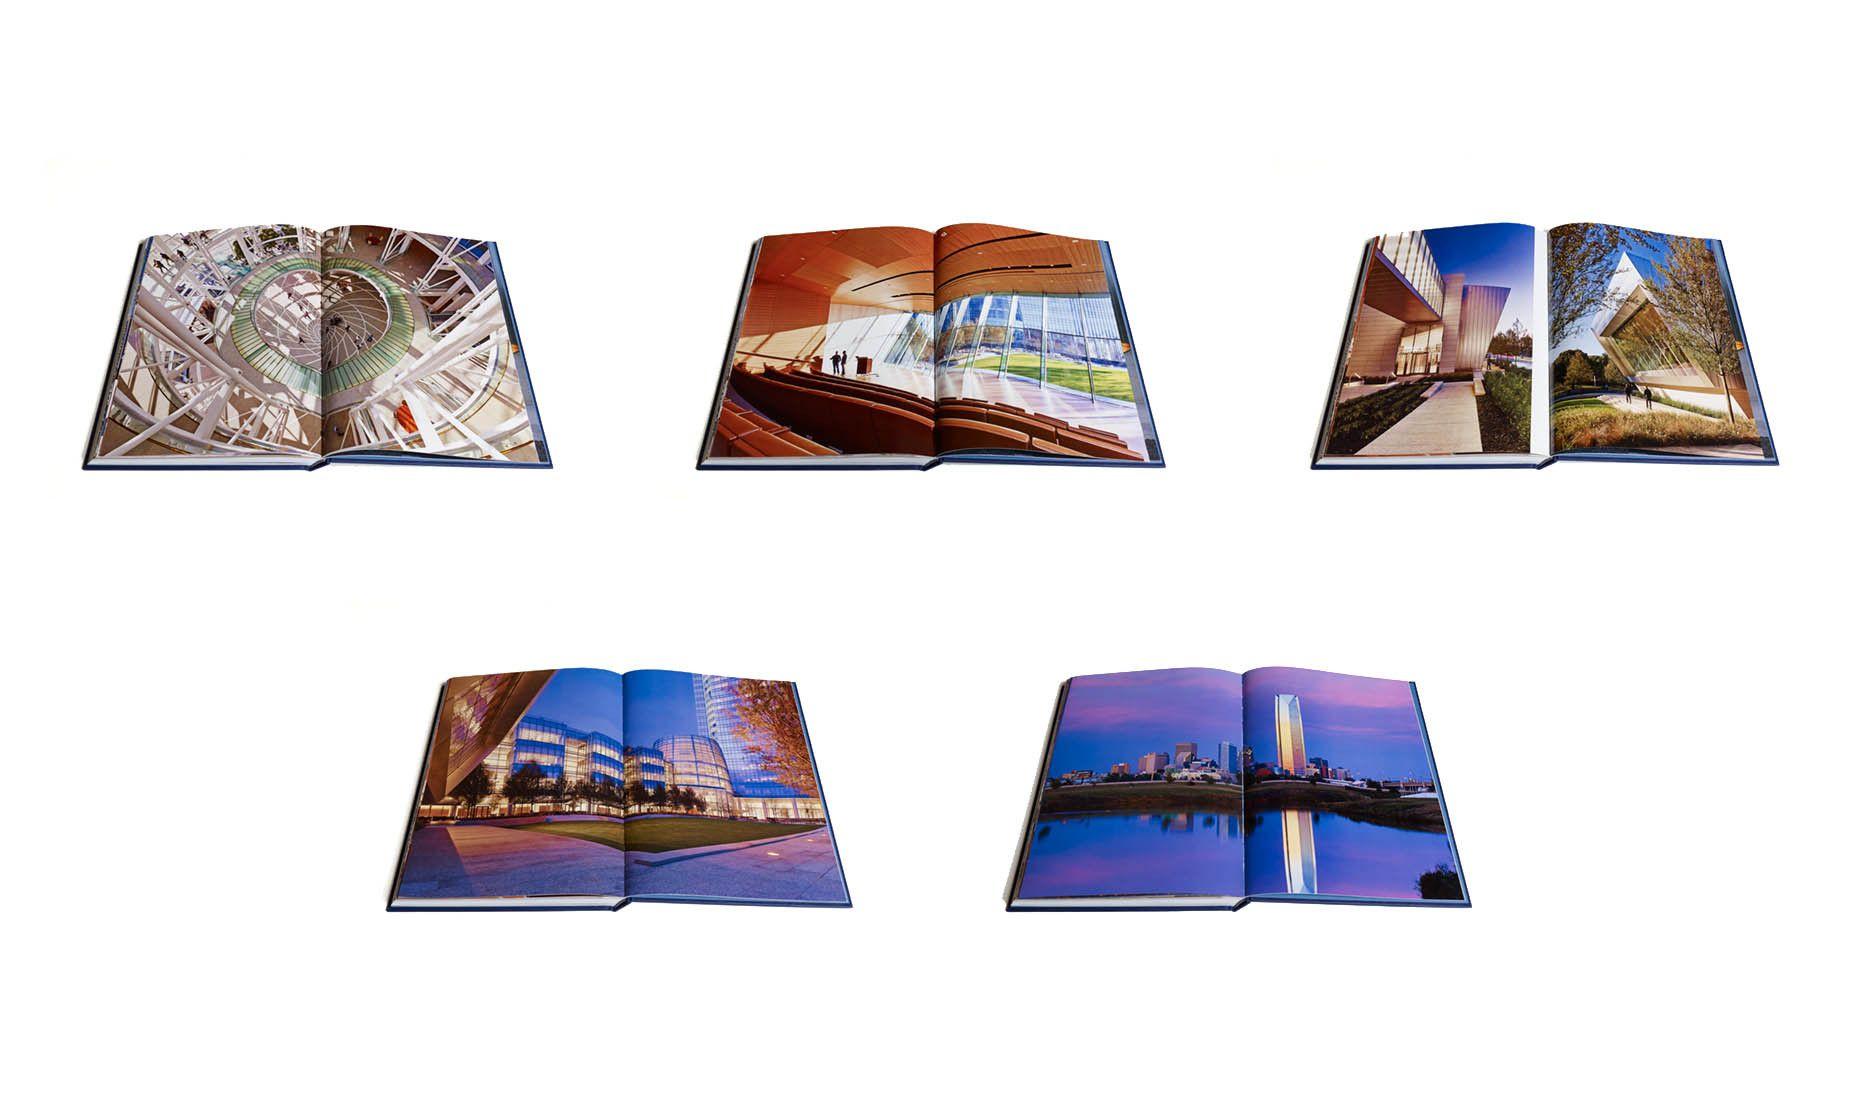 DEVON . IMAGES PUBLISHING . PICKARD CHILTON . CONTRIBUTING PHOTOGRAPHER